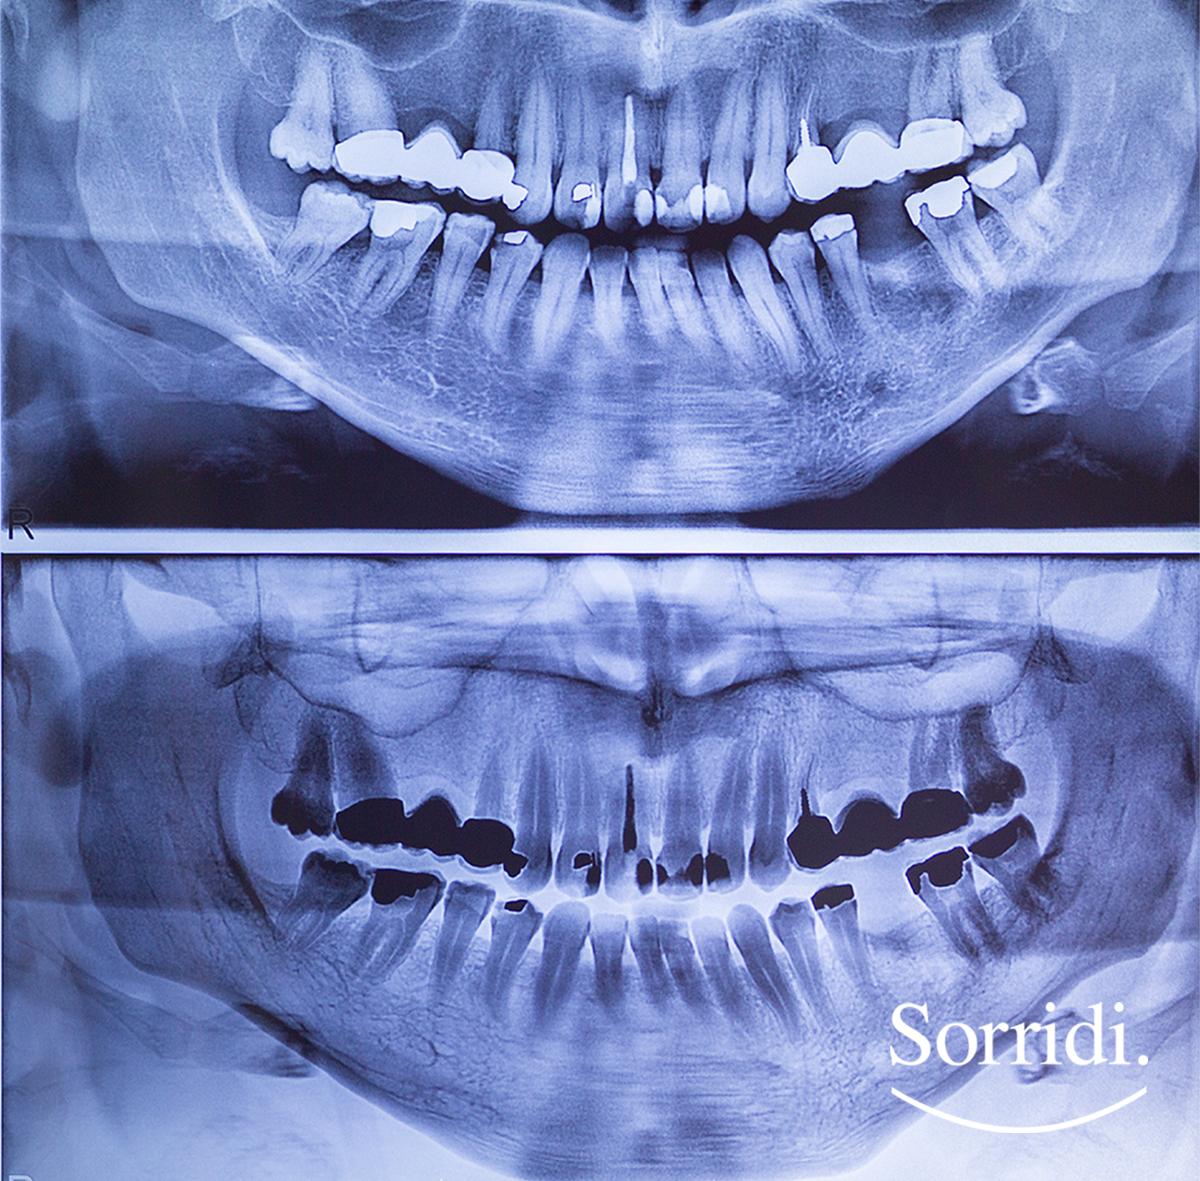 raggi-x-Sorridi-magazine-il-dentista-risponde - radiografie dentali